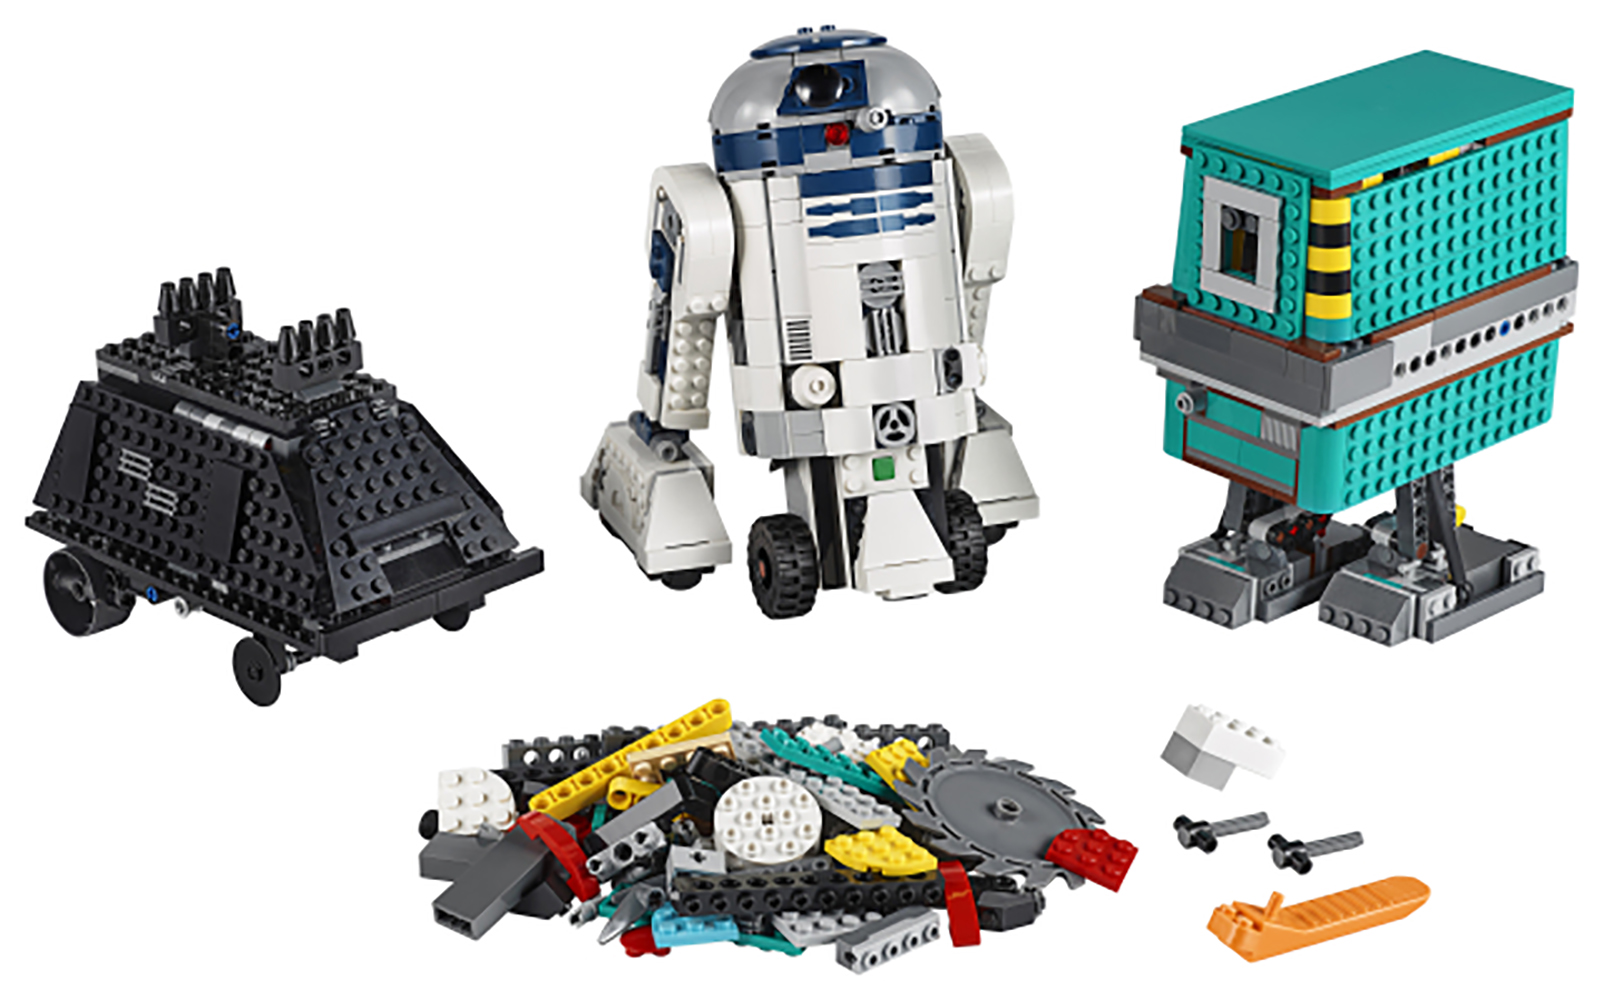 Star Wars - Boost R2D2 Commandant droide